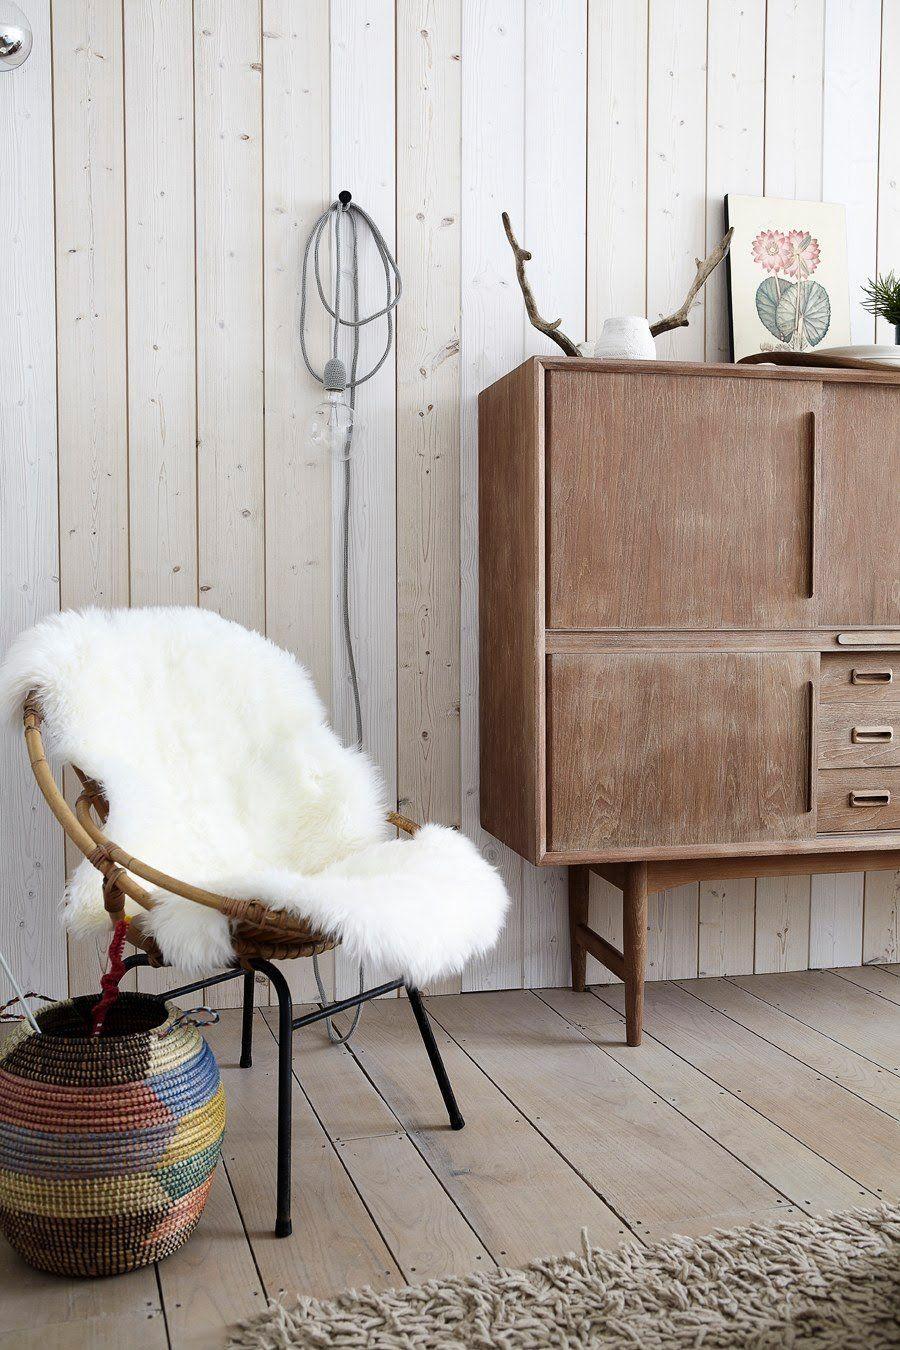 Muebles Cemento Stunning Mueble Para Mariana Biblioteca Cemento  # Muebles Cemento Liviano